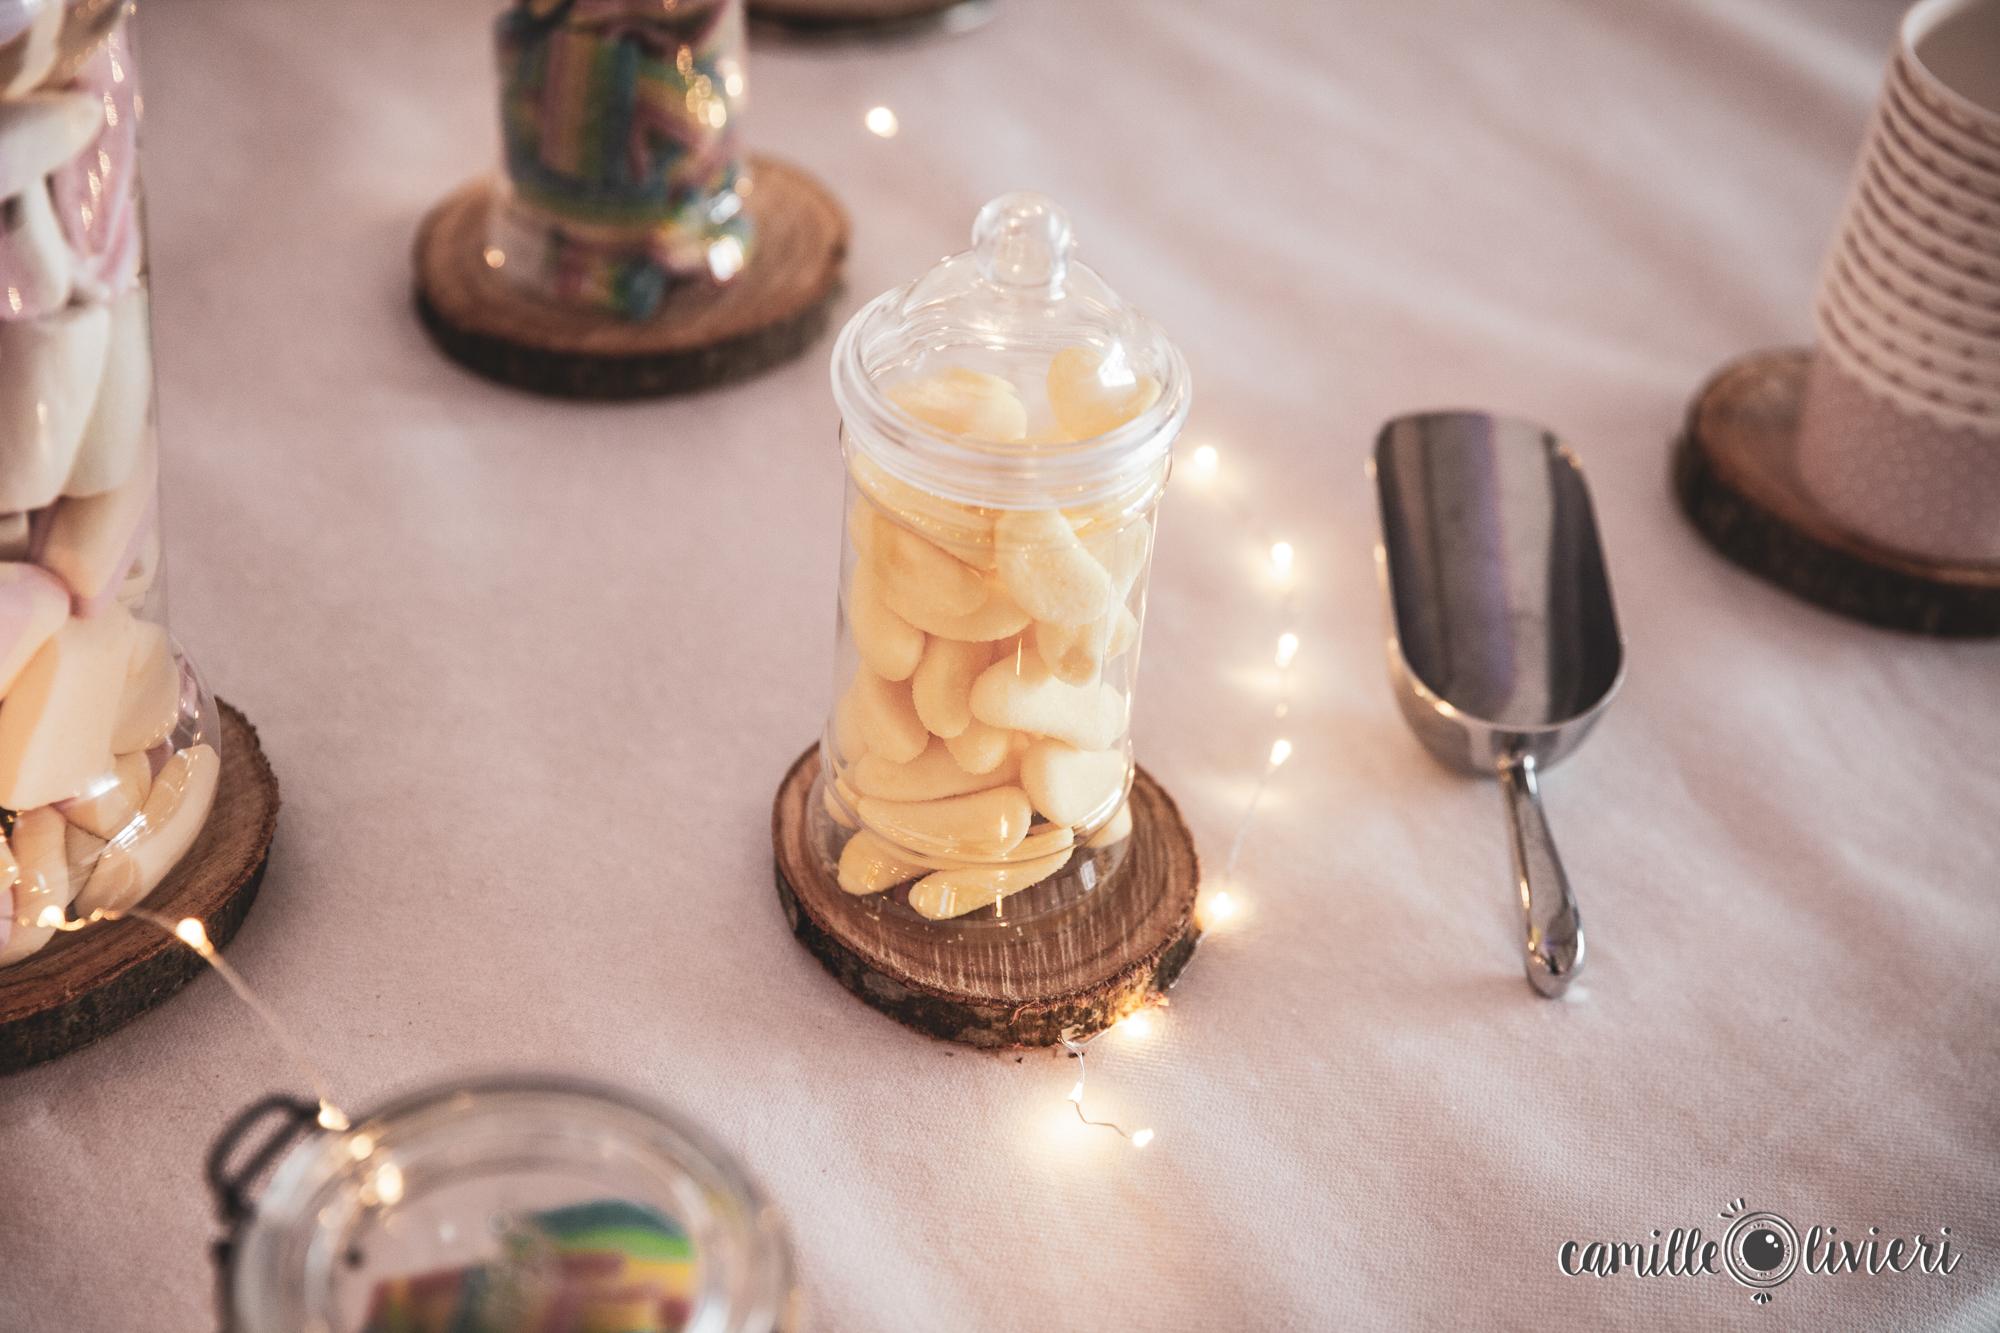 photographe_grenoble_mariage-camille-olivieri-83